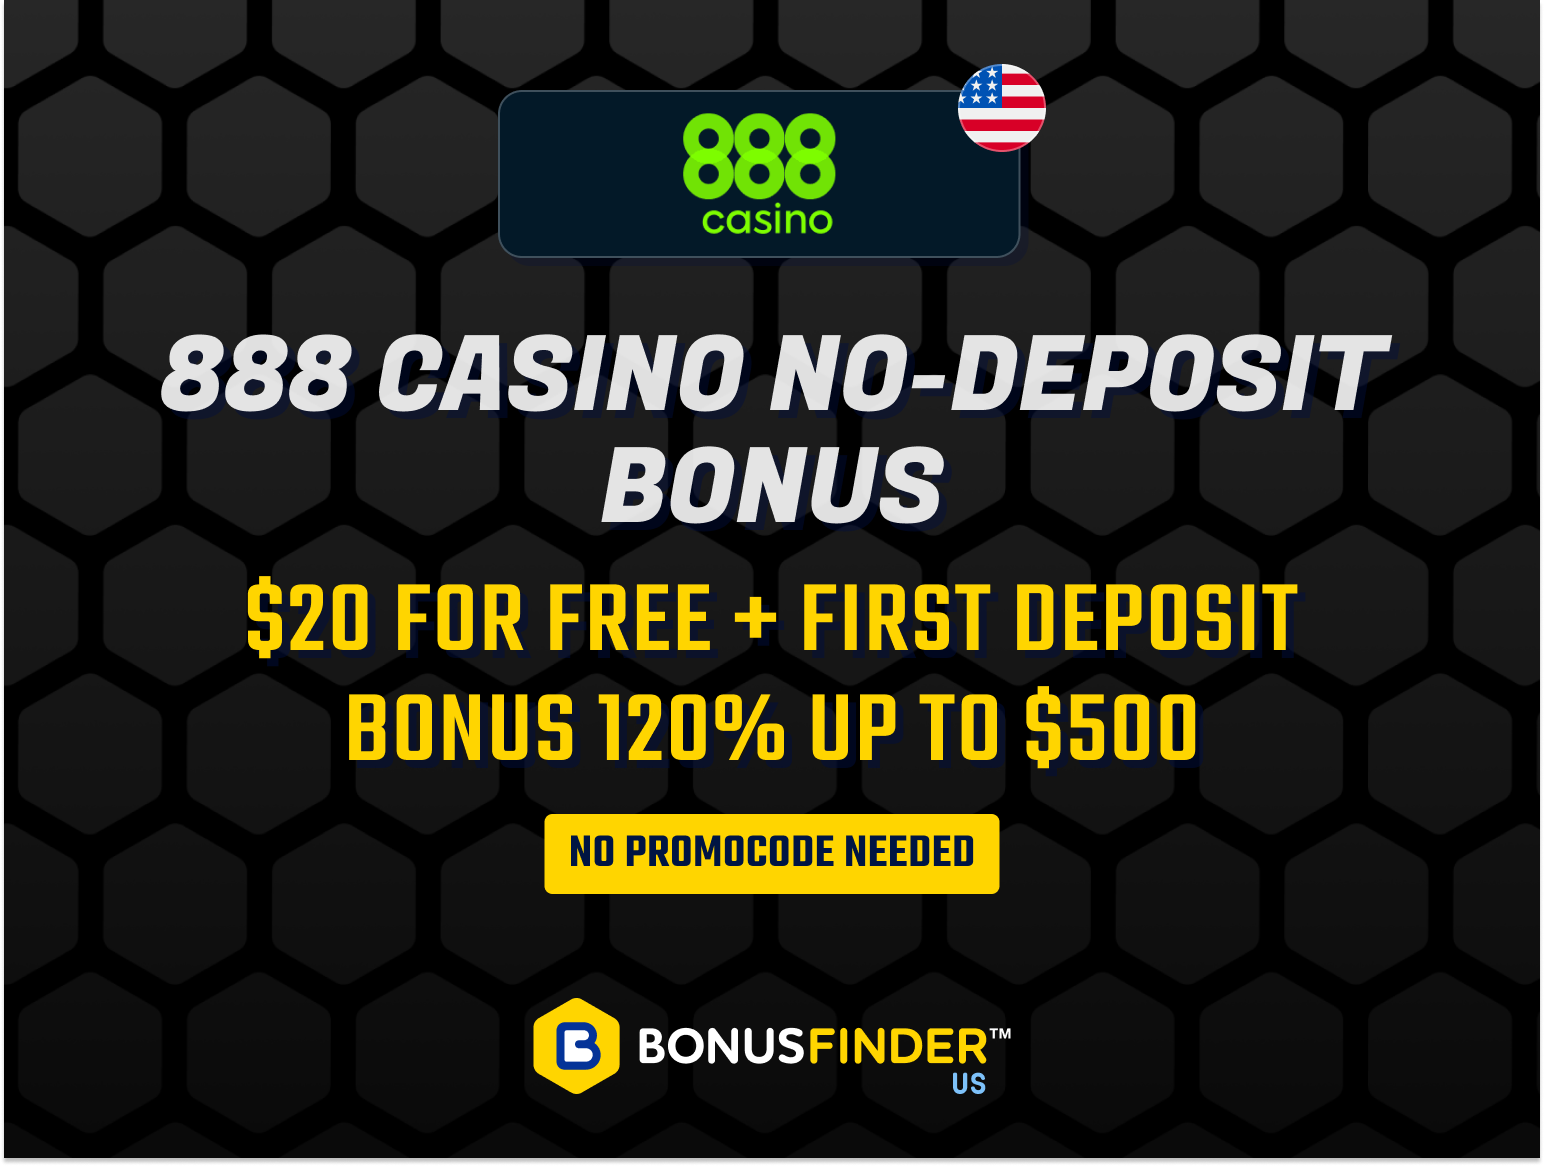 888 casino loteria federal 66203